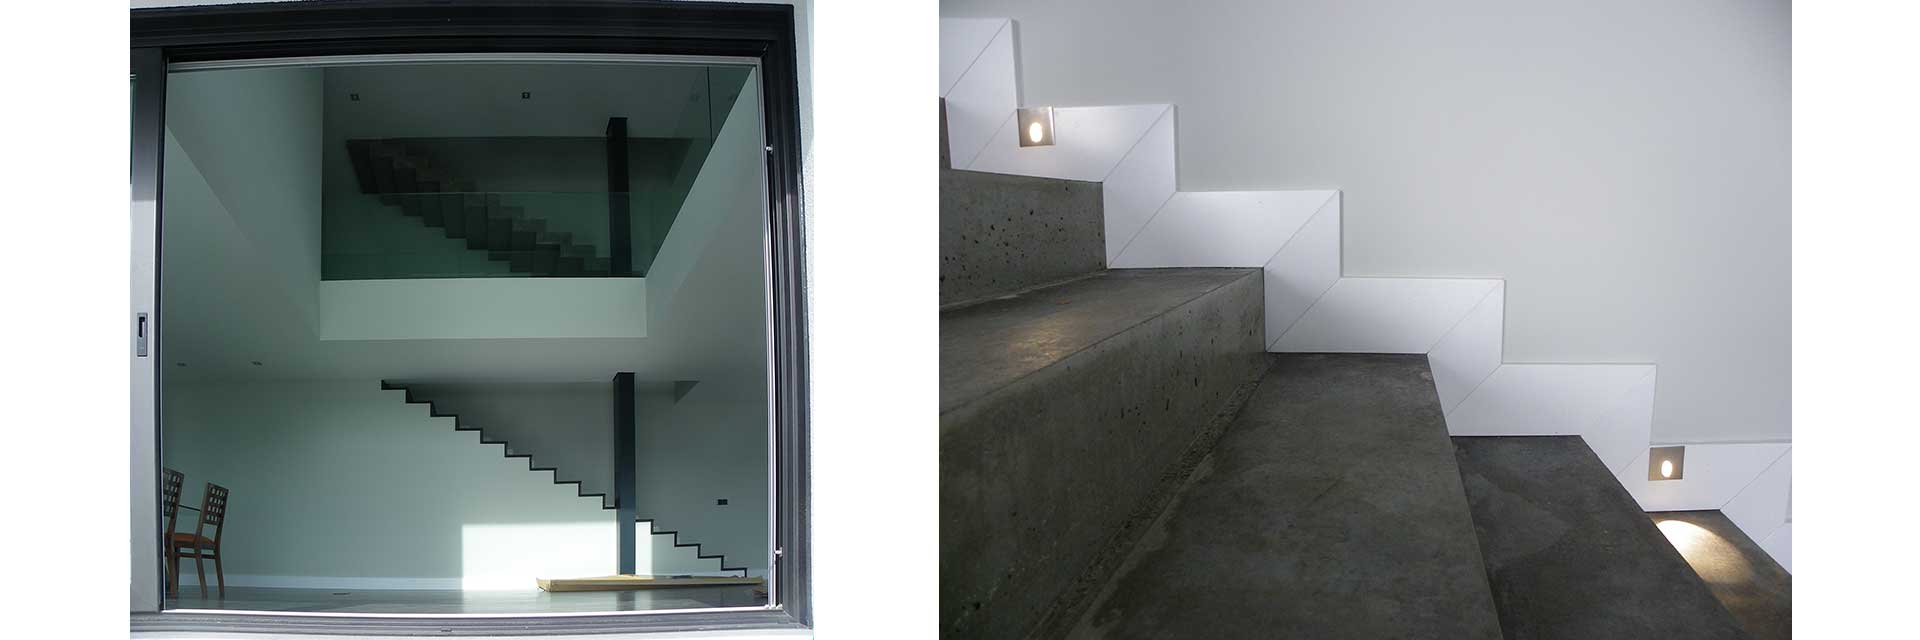 escaleras-casas